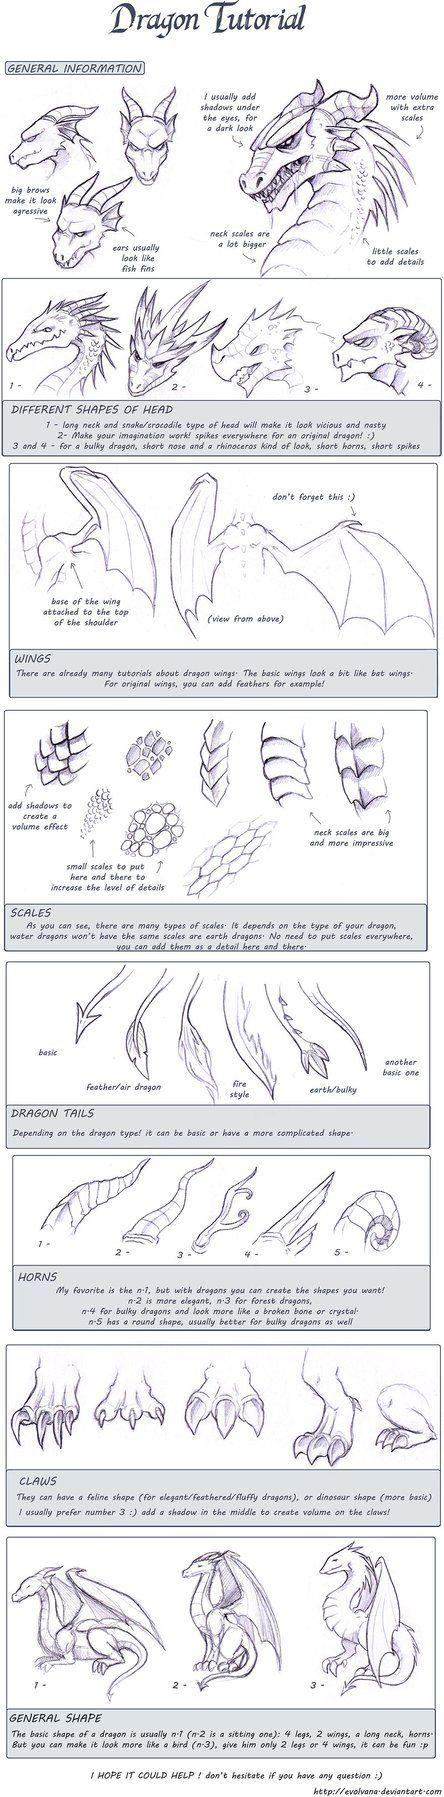 Dragon tutorial. Now you can draw Smaug.